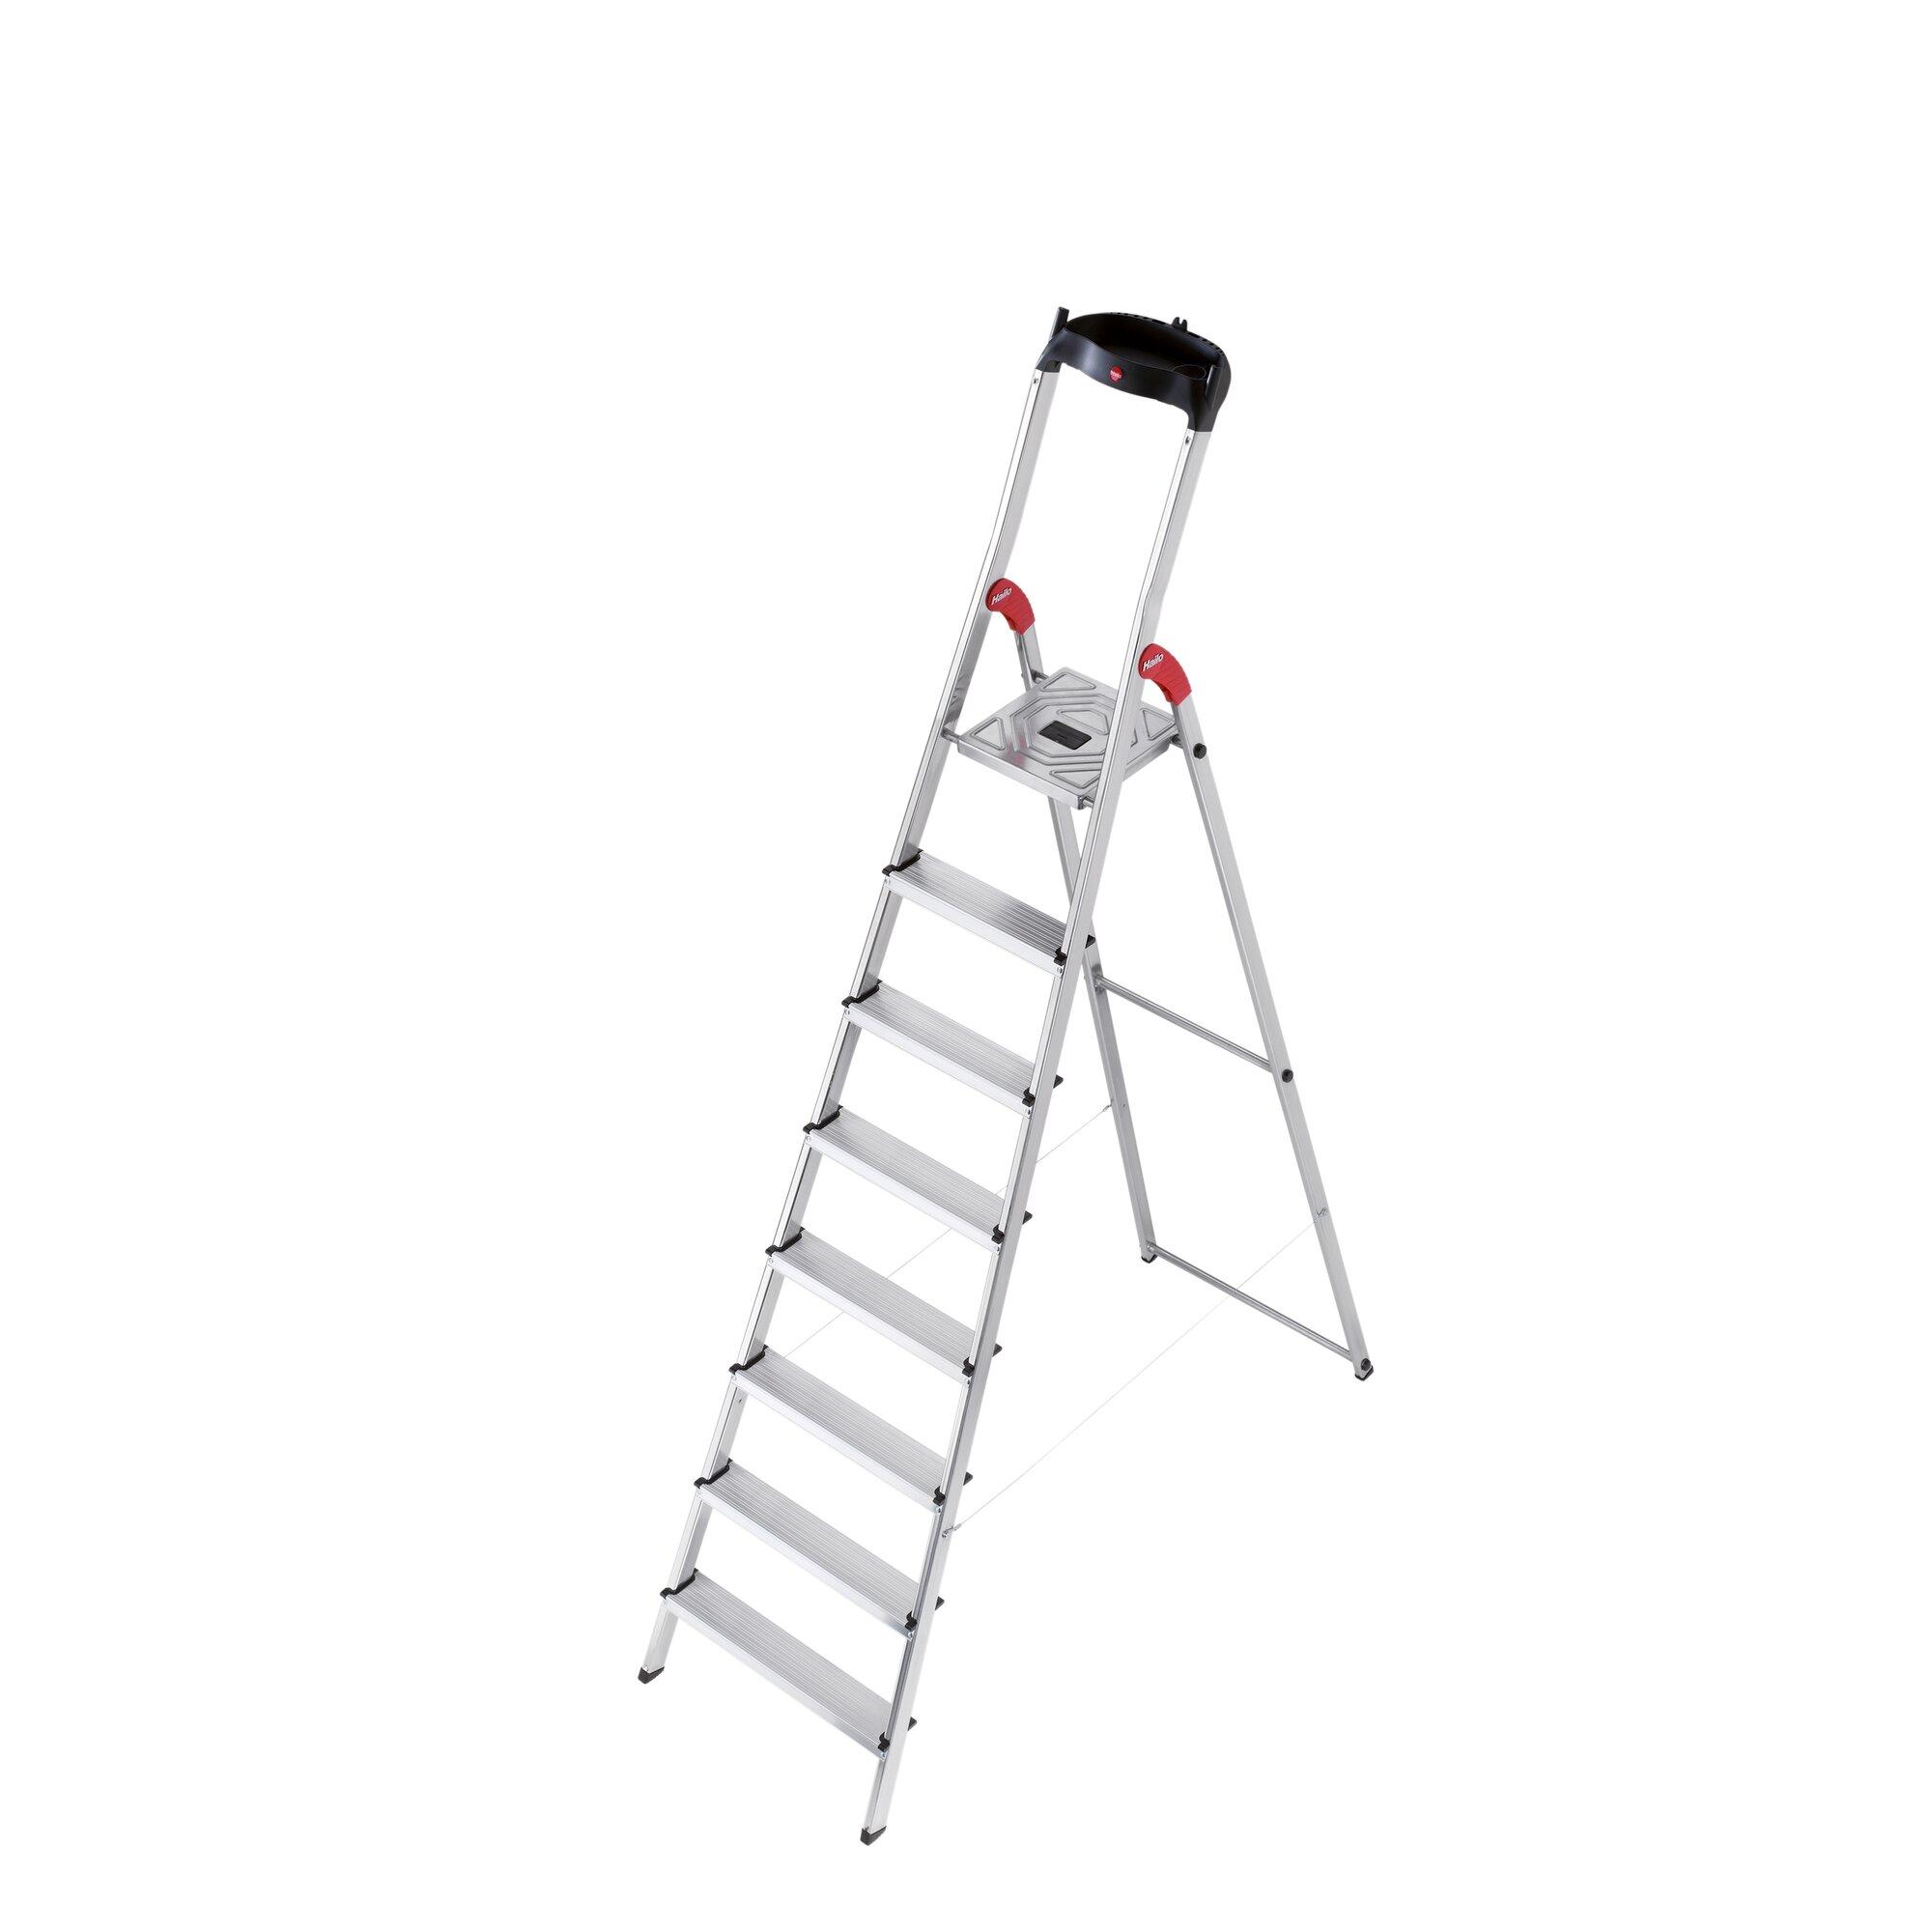 Hailo Usa Inc 7 64 Ft Aluminum Step Ladder With 330 Lb